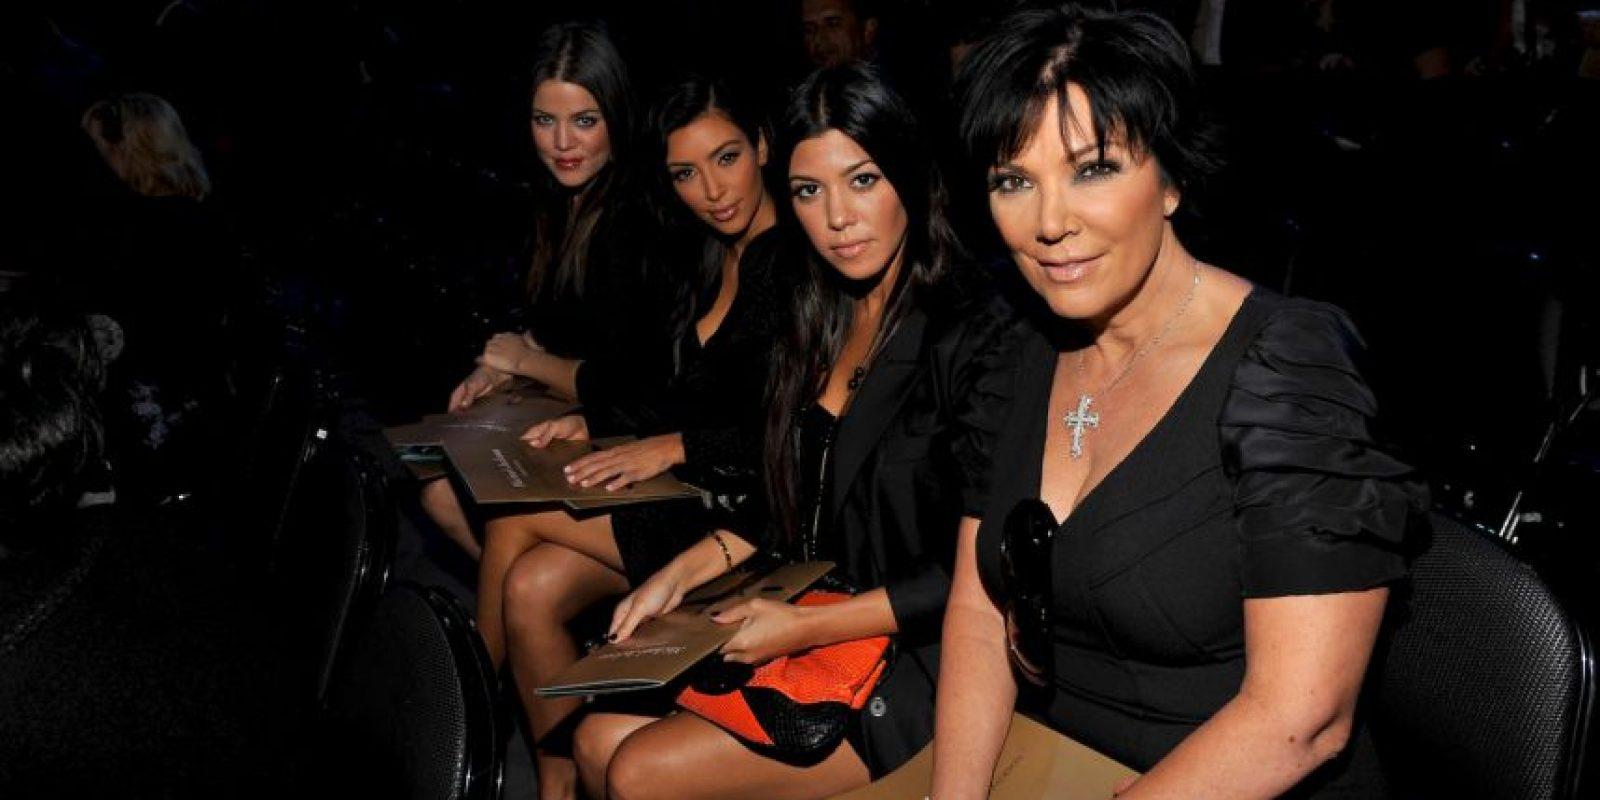 Kris Jenner, Kim, Kourtney y Khloe Kardashian Foto:Getty Images